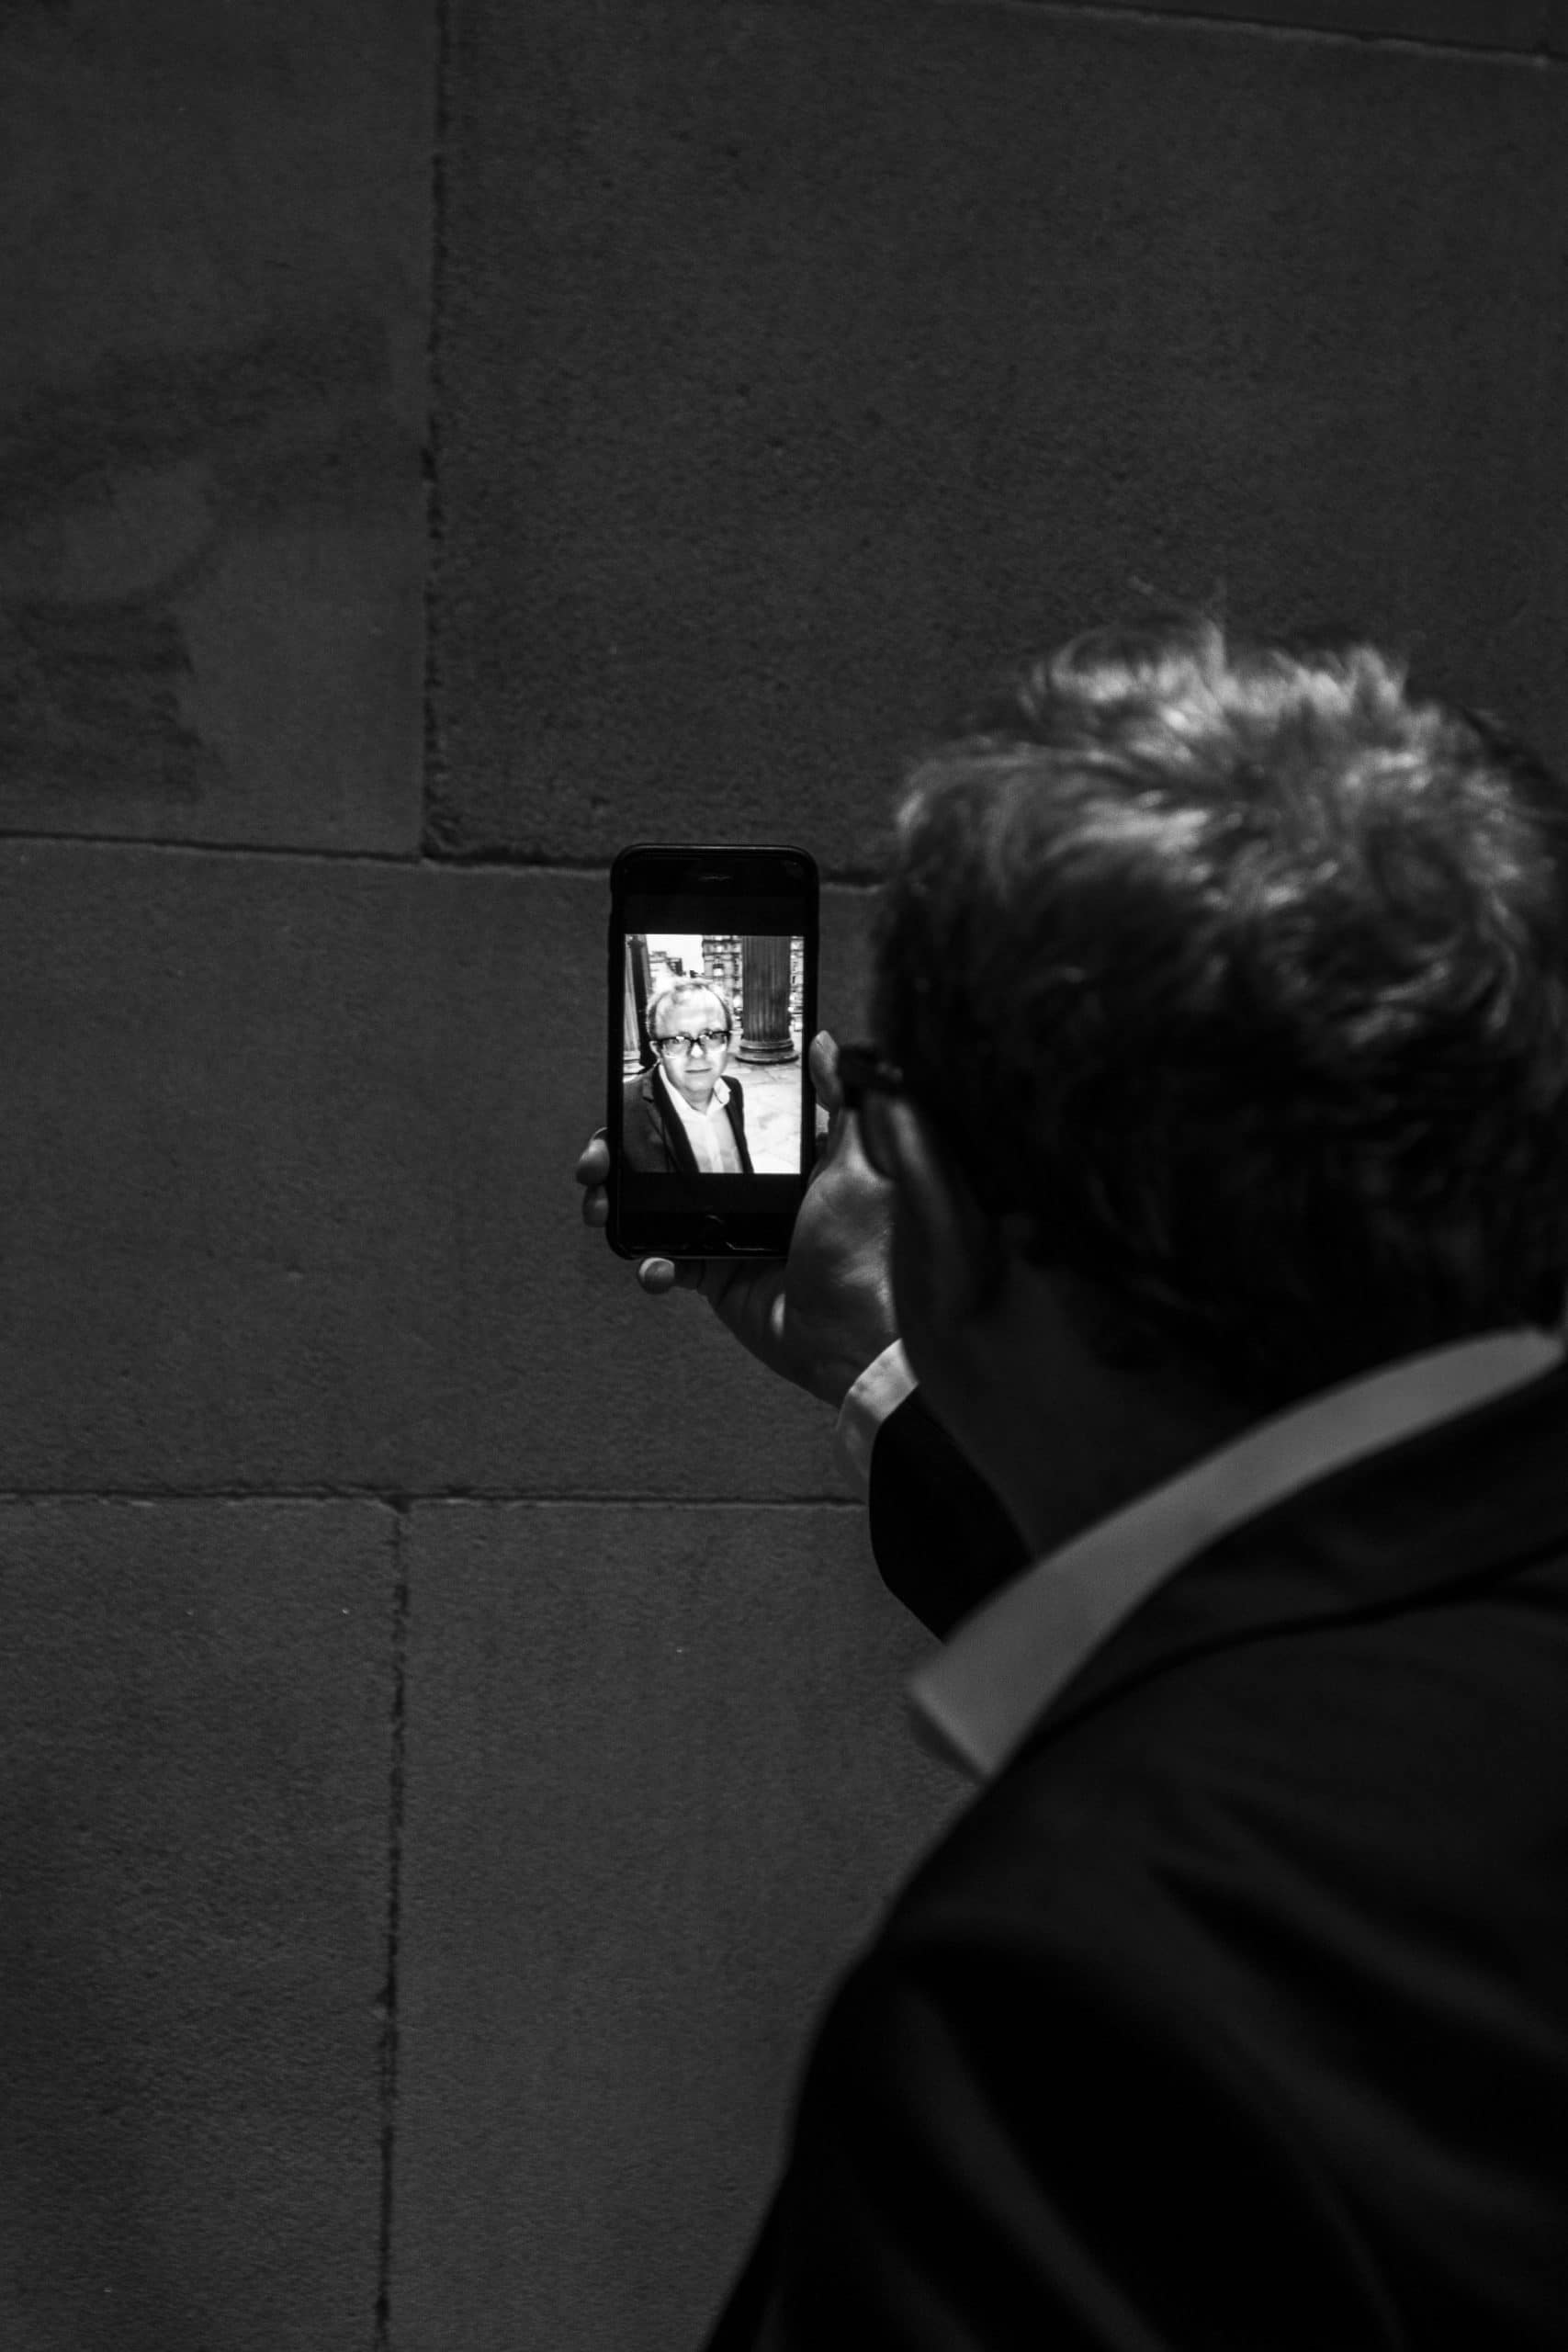 Ipad-magician-selfie